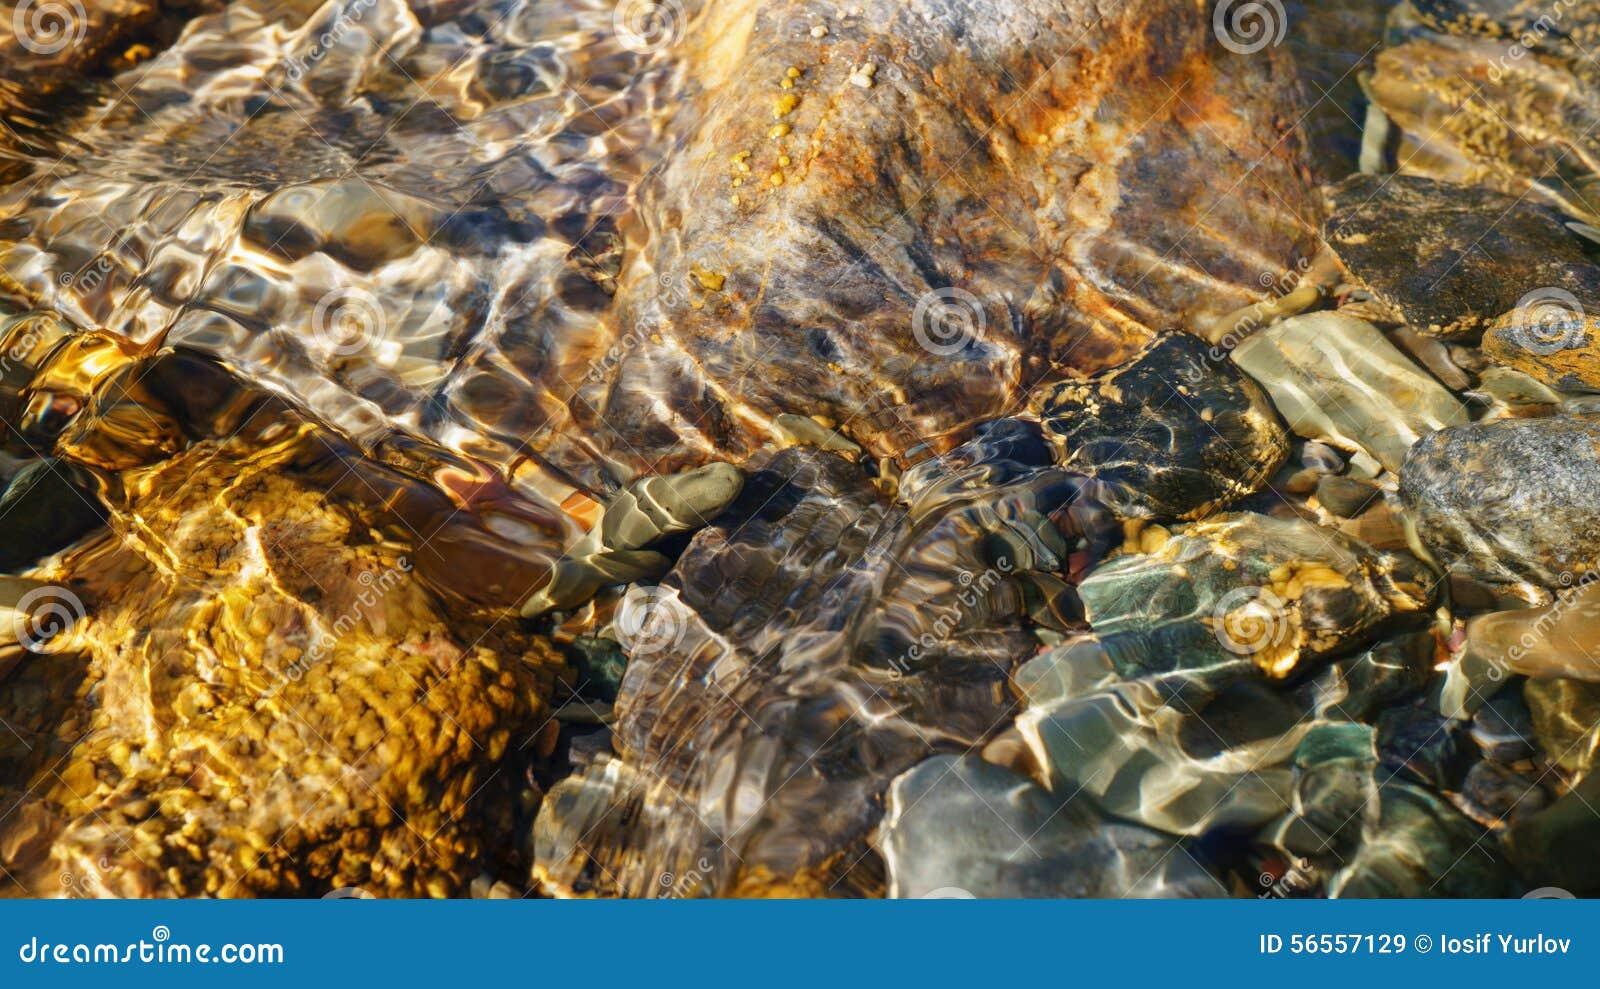 Download Κρύσταλλο - καθαρίστε το νερό του μικρού ρυακιού στη στέπα Altai Στοκ Εικόνα - εικόνα από πέτρα, εύθυμος: 56557129